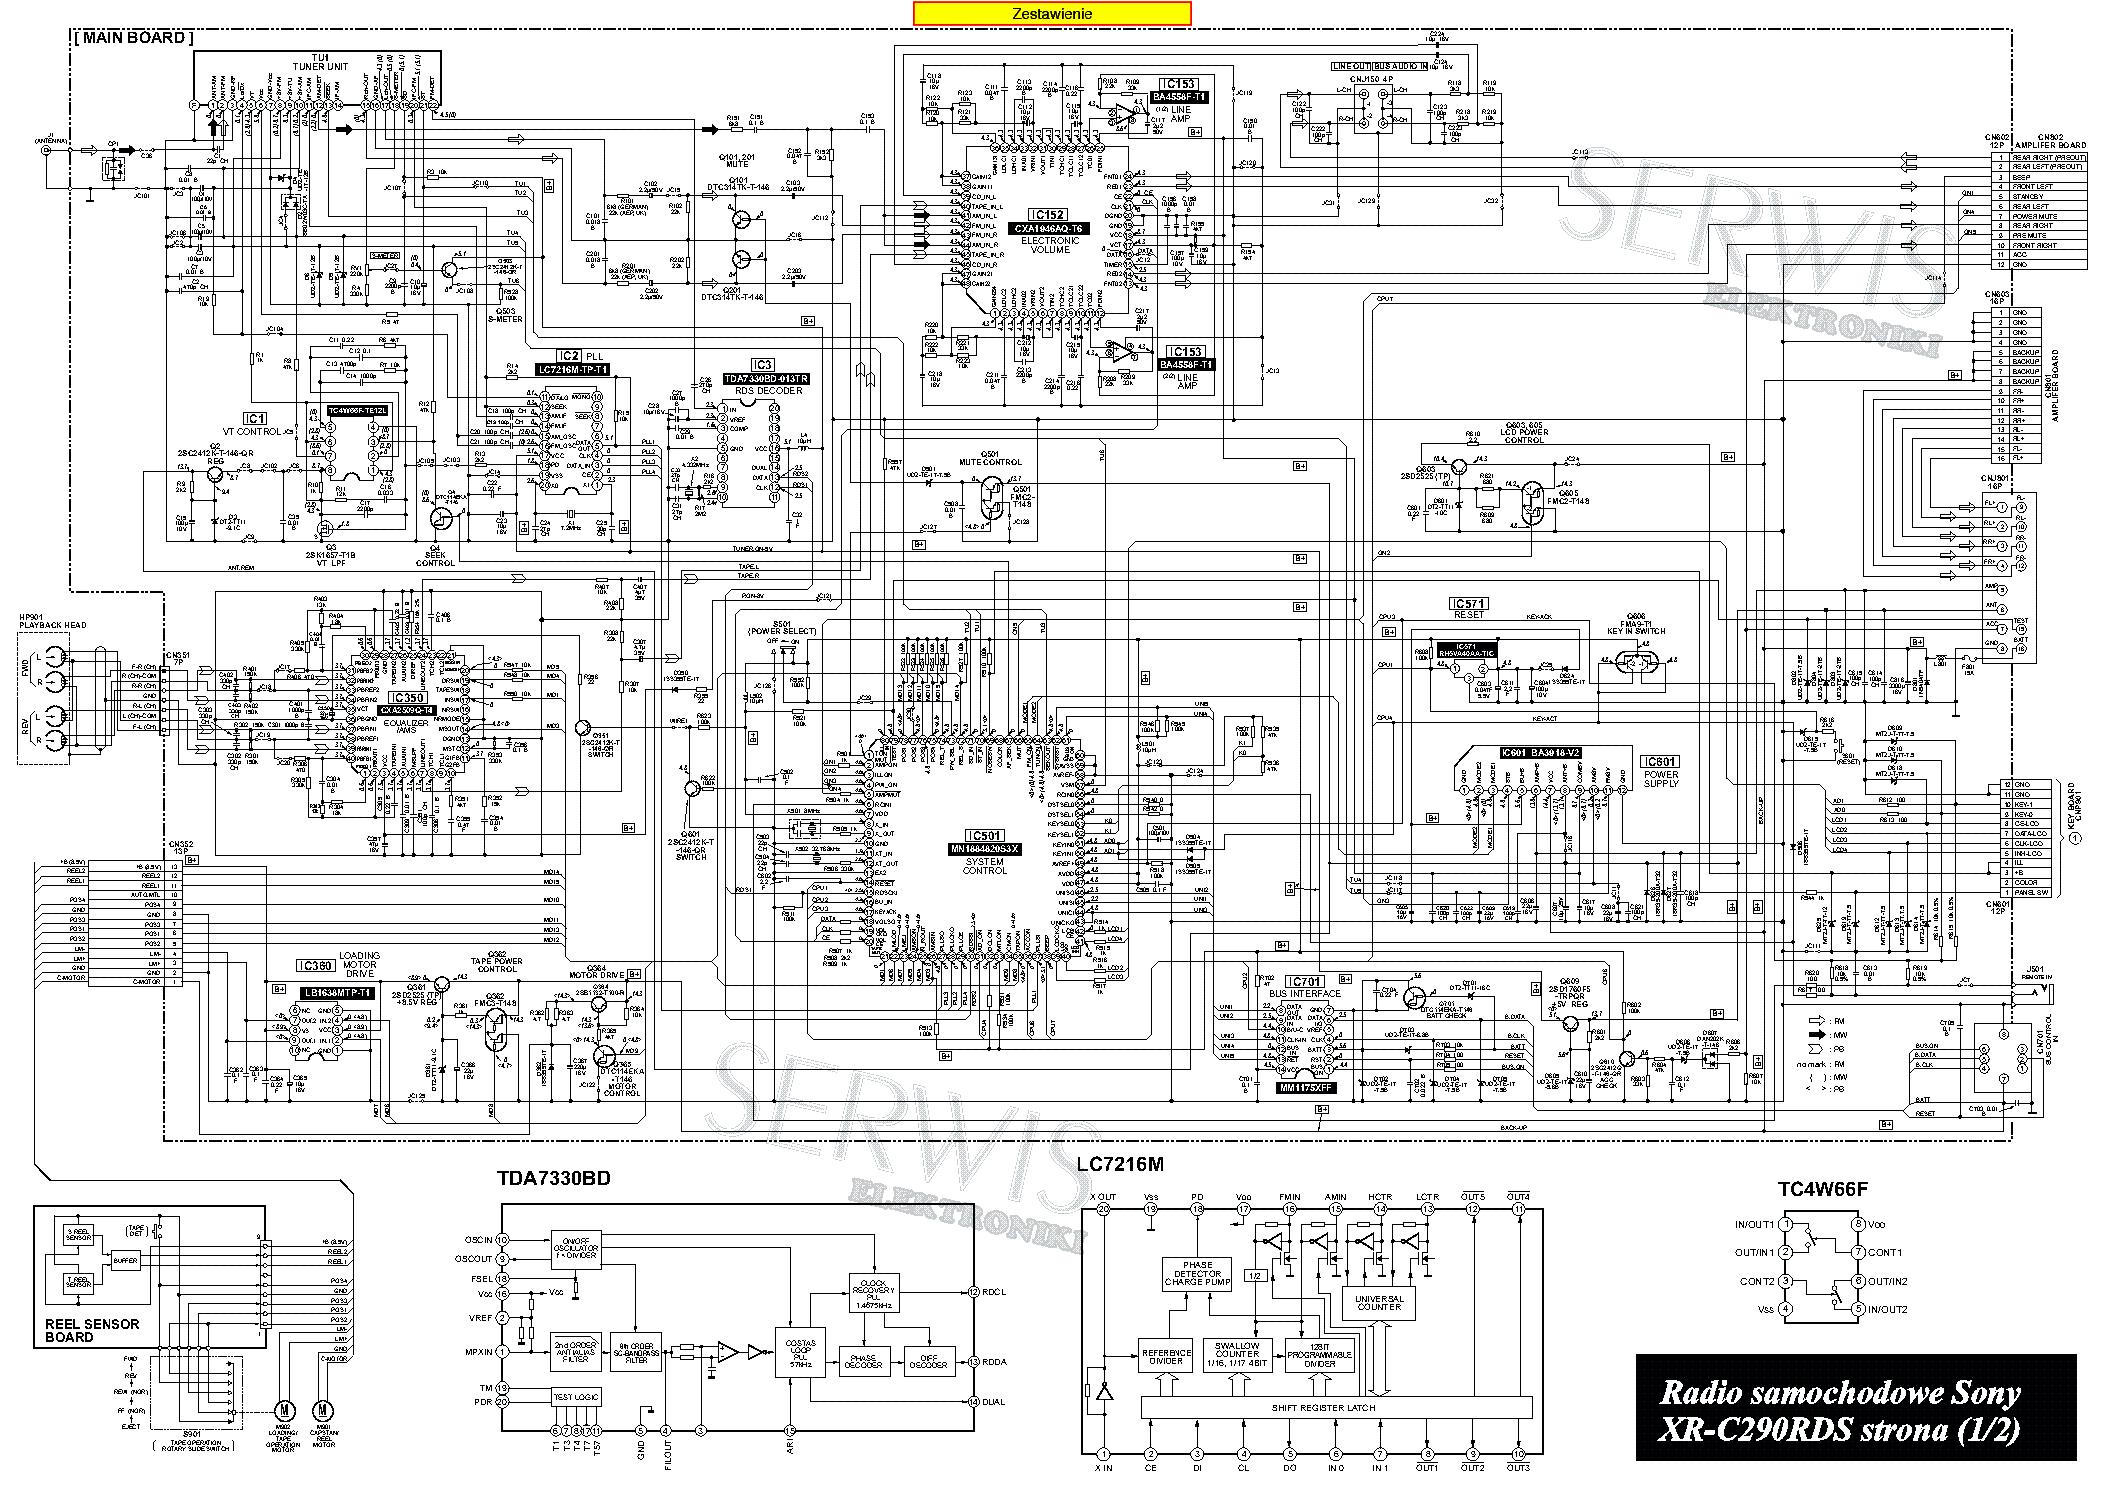 sony cdx c410 wiring diagram wiring online diagramwiring diagram for sony xr c410 radio readingrat net sony cdx gt5 10 wiring sony cdx c410 wiring diagram